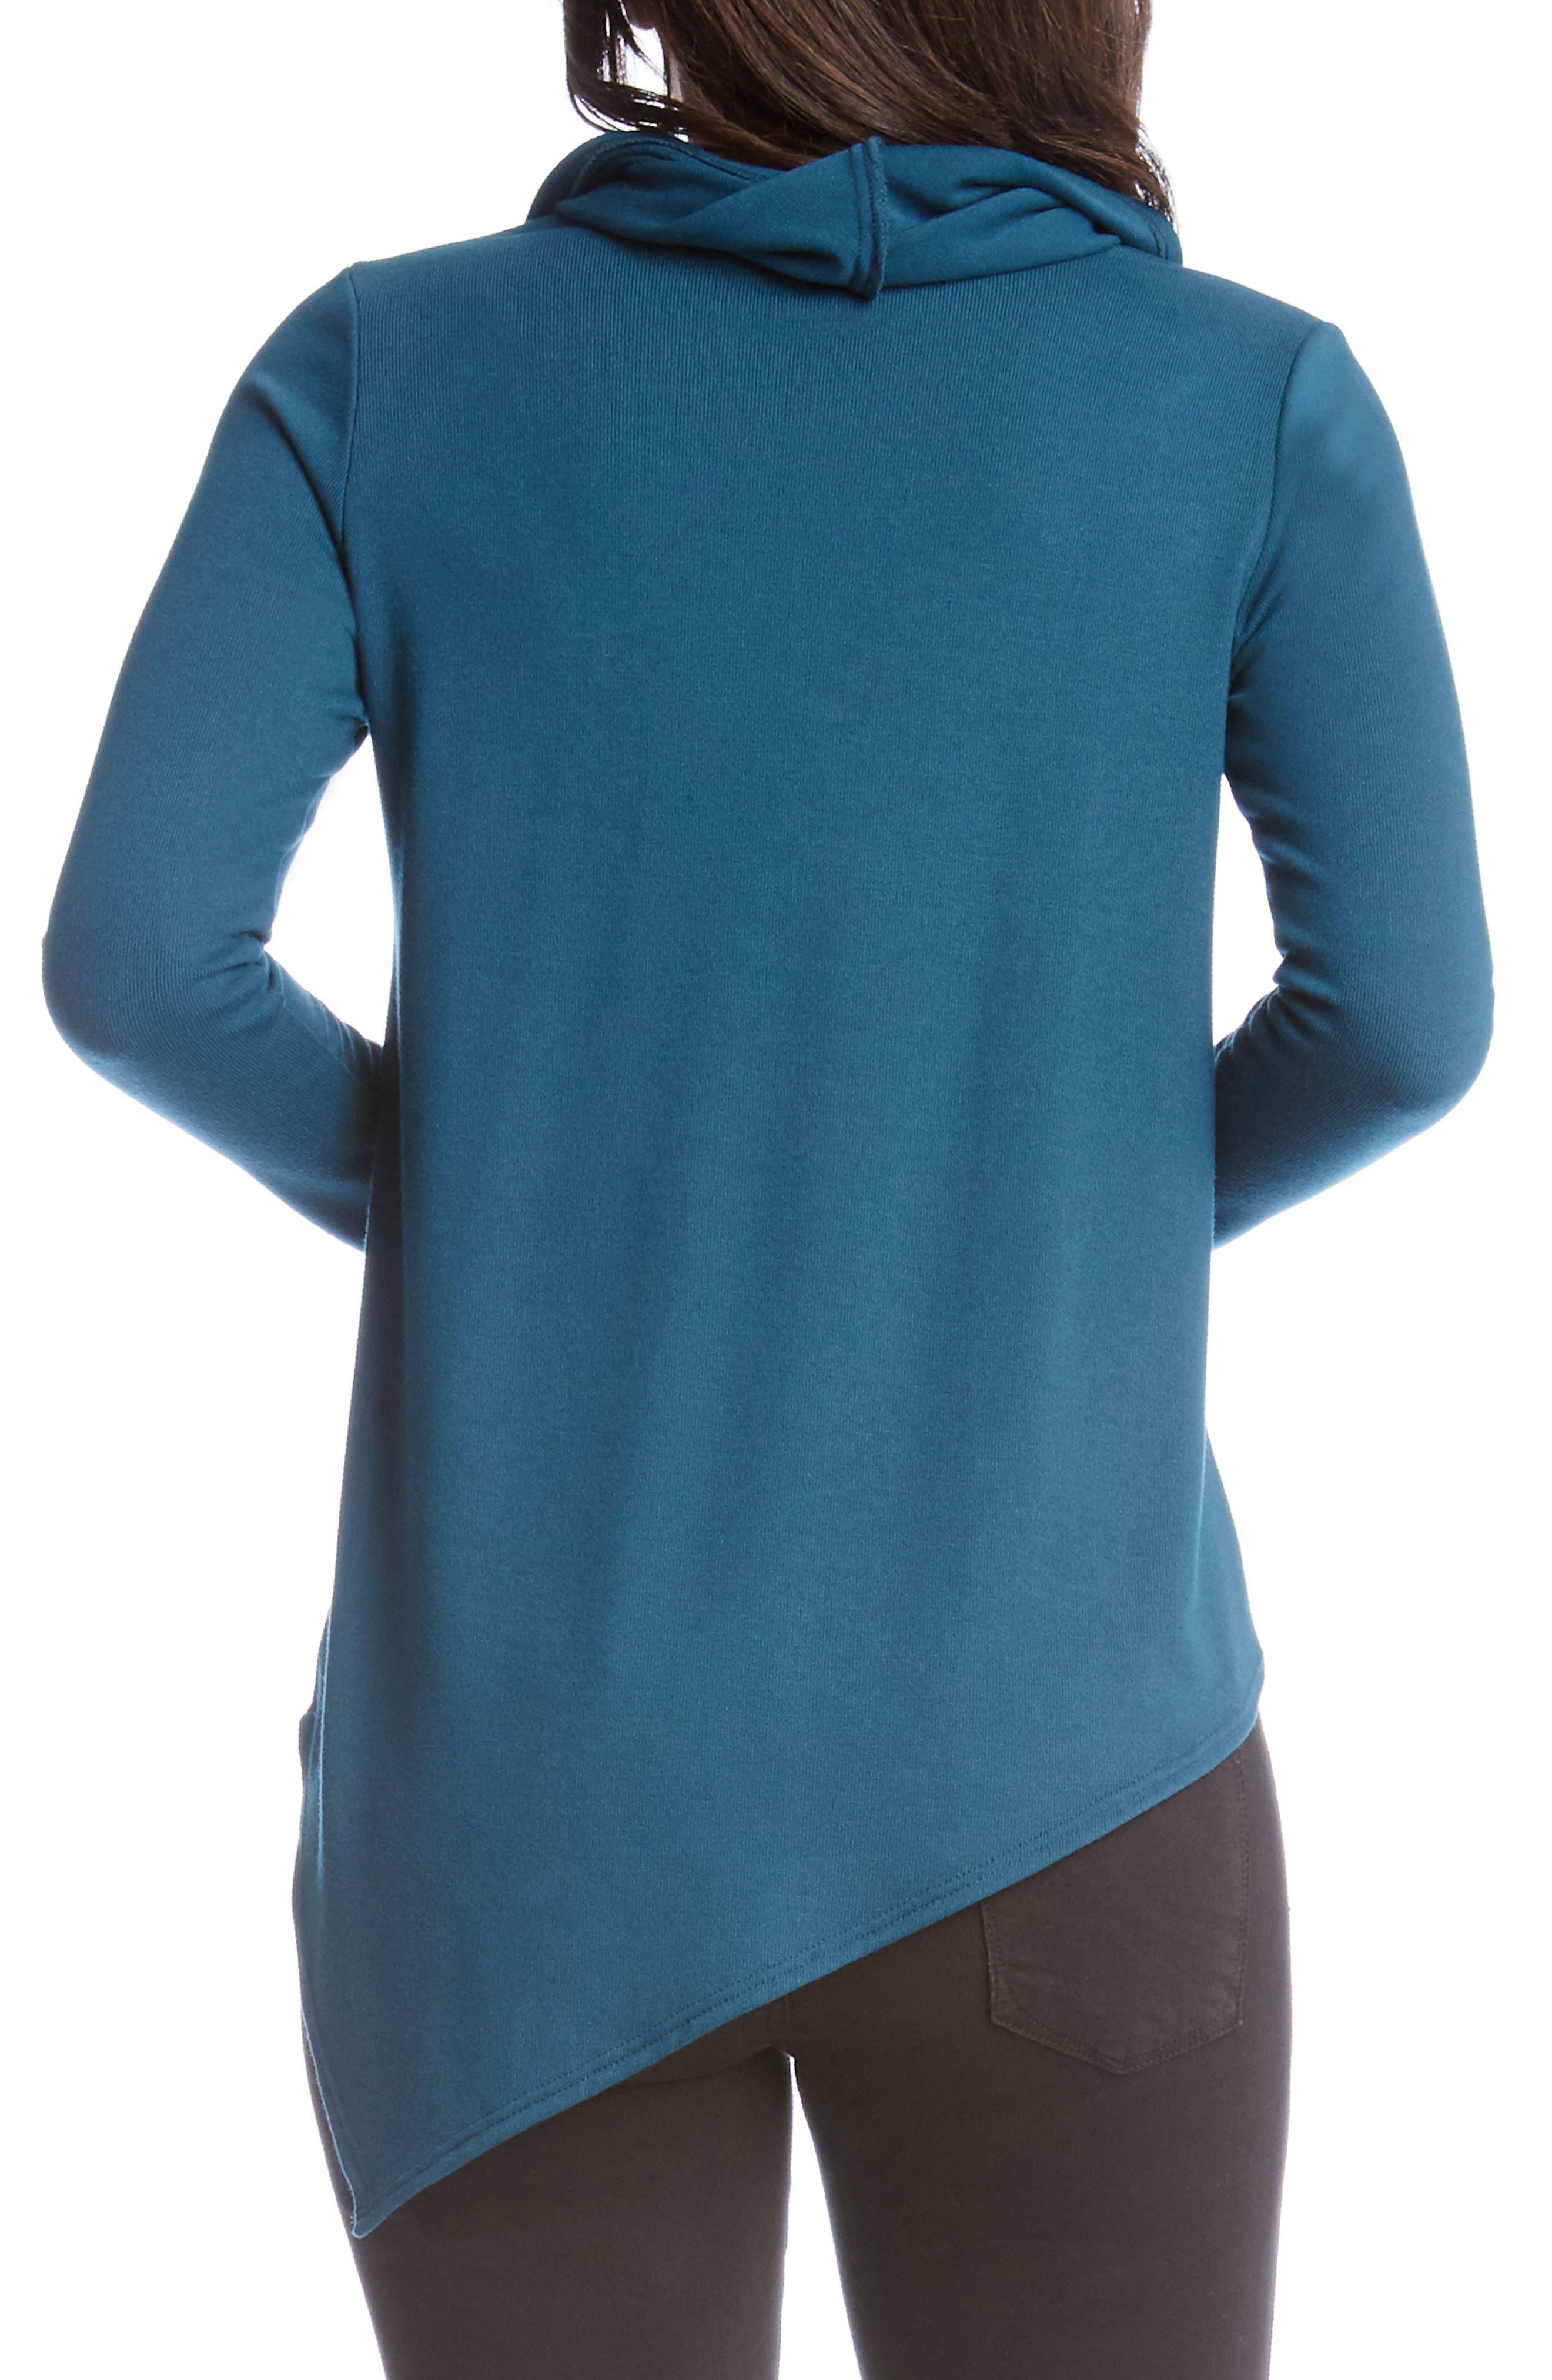 Cowl Neck Asymmetrical Sweater,                             Alternate thumbnail 2, color,                             340